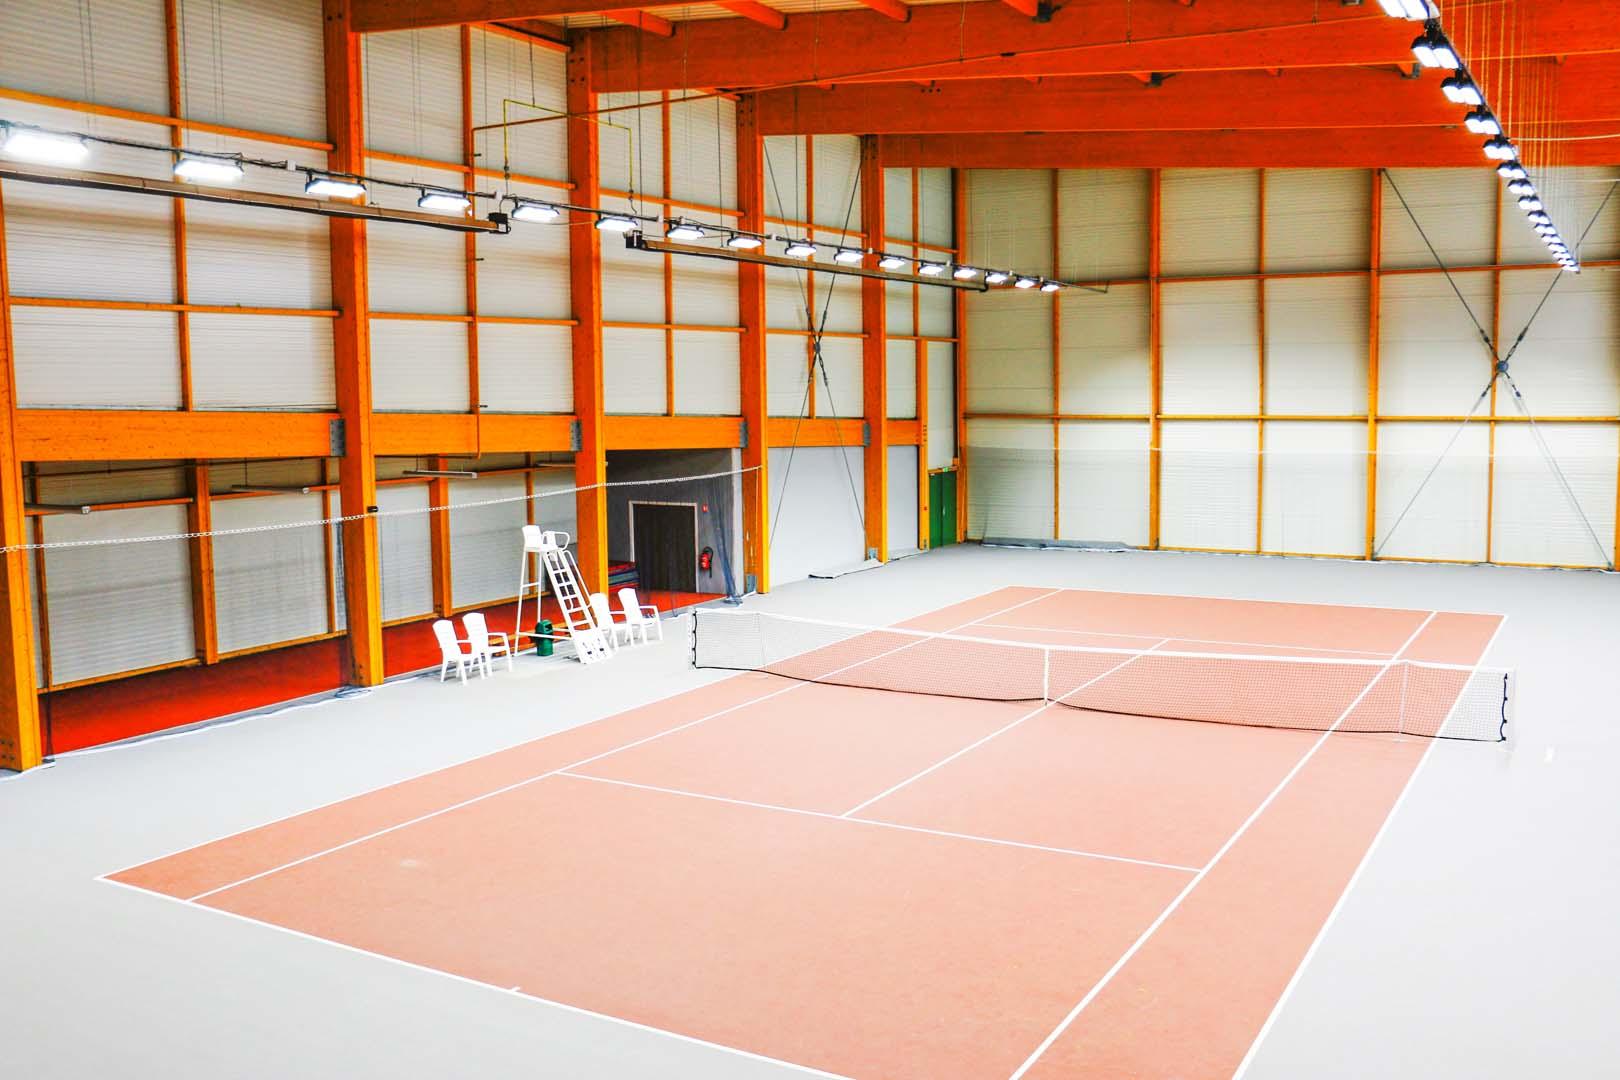 NLX-Tennis-ligue-val-d-oise-03